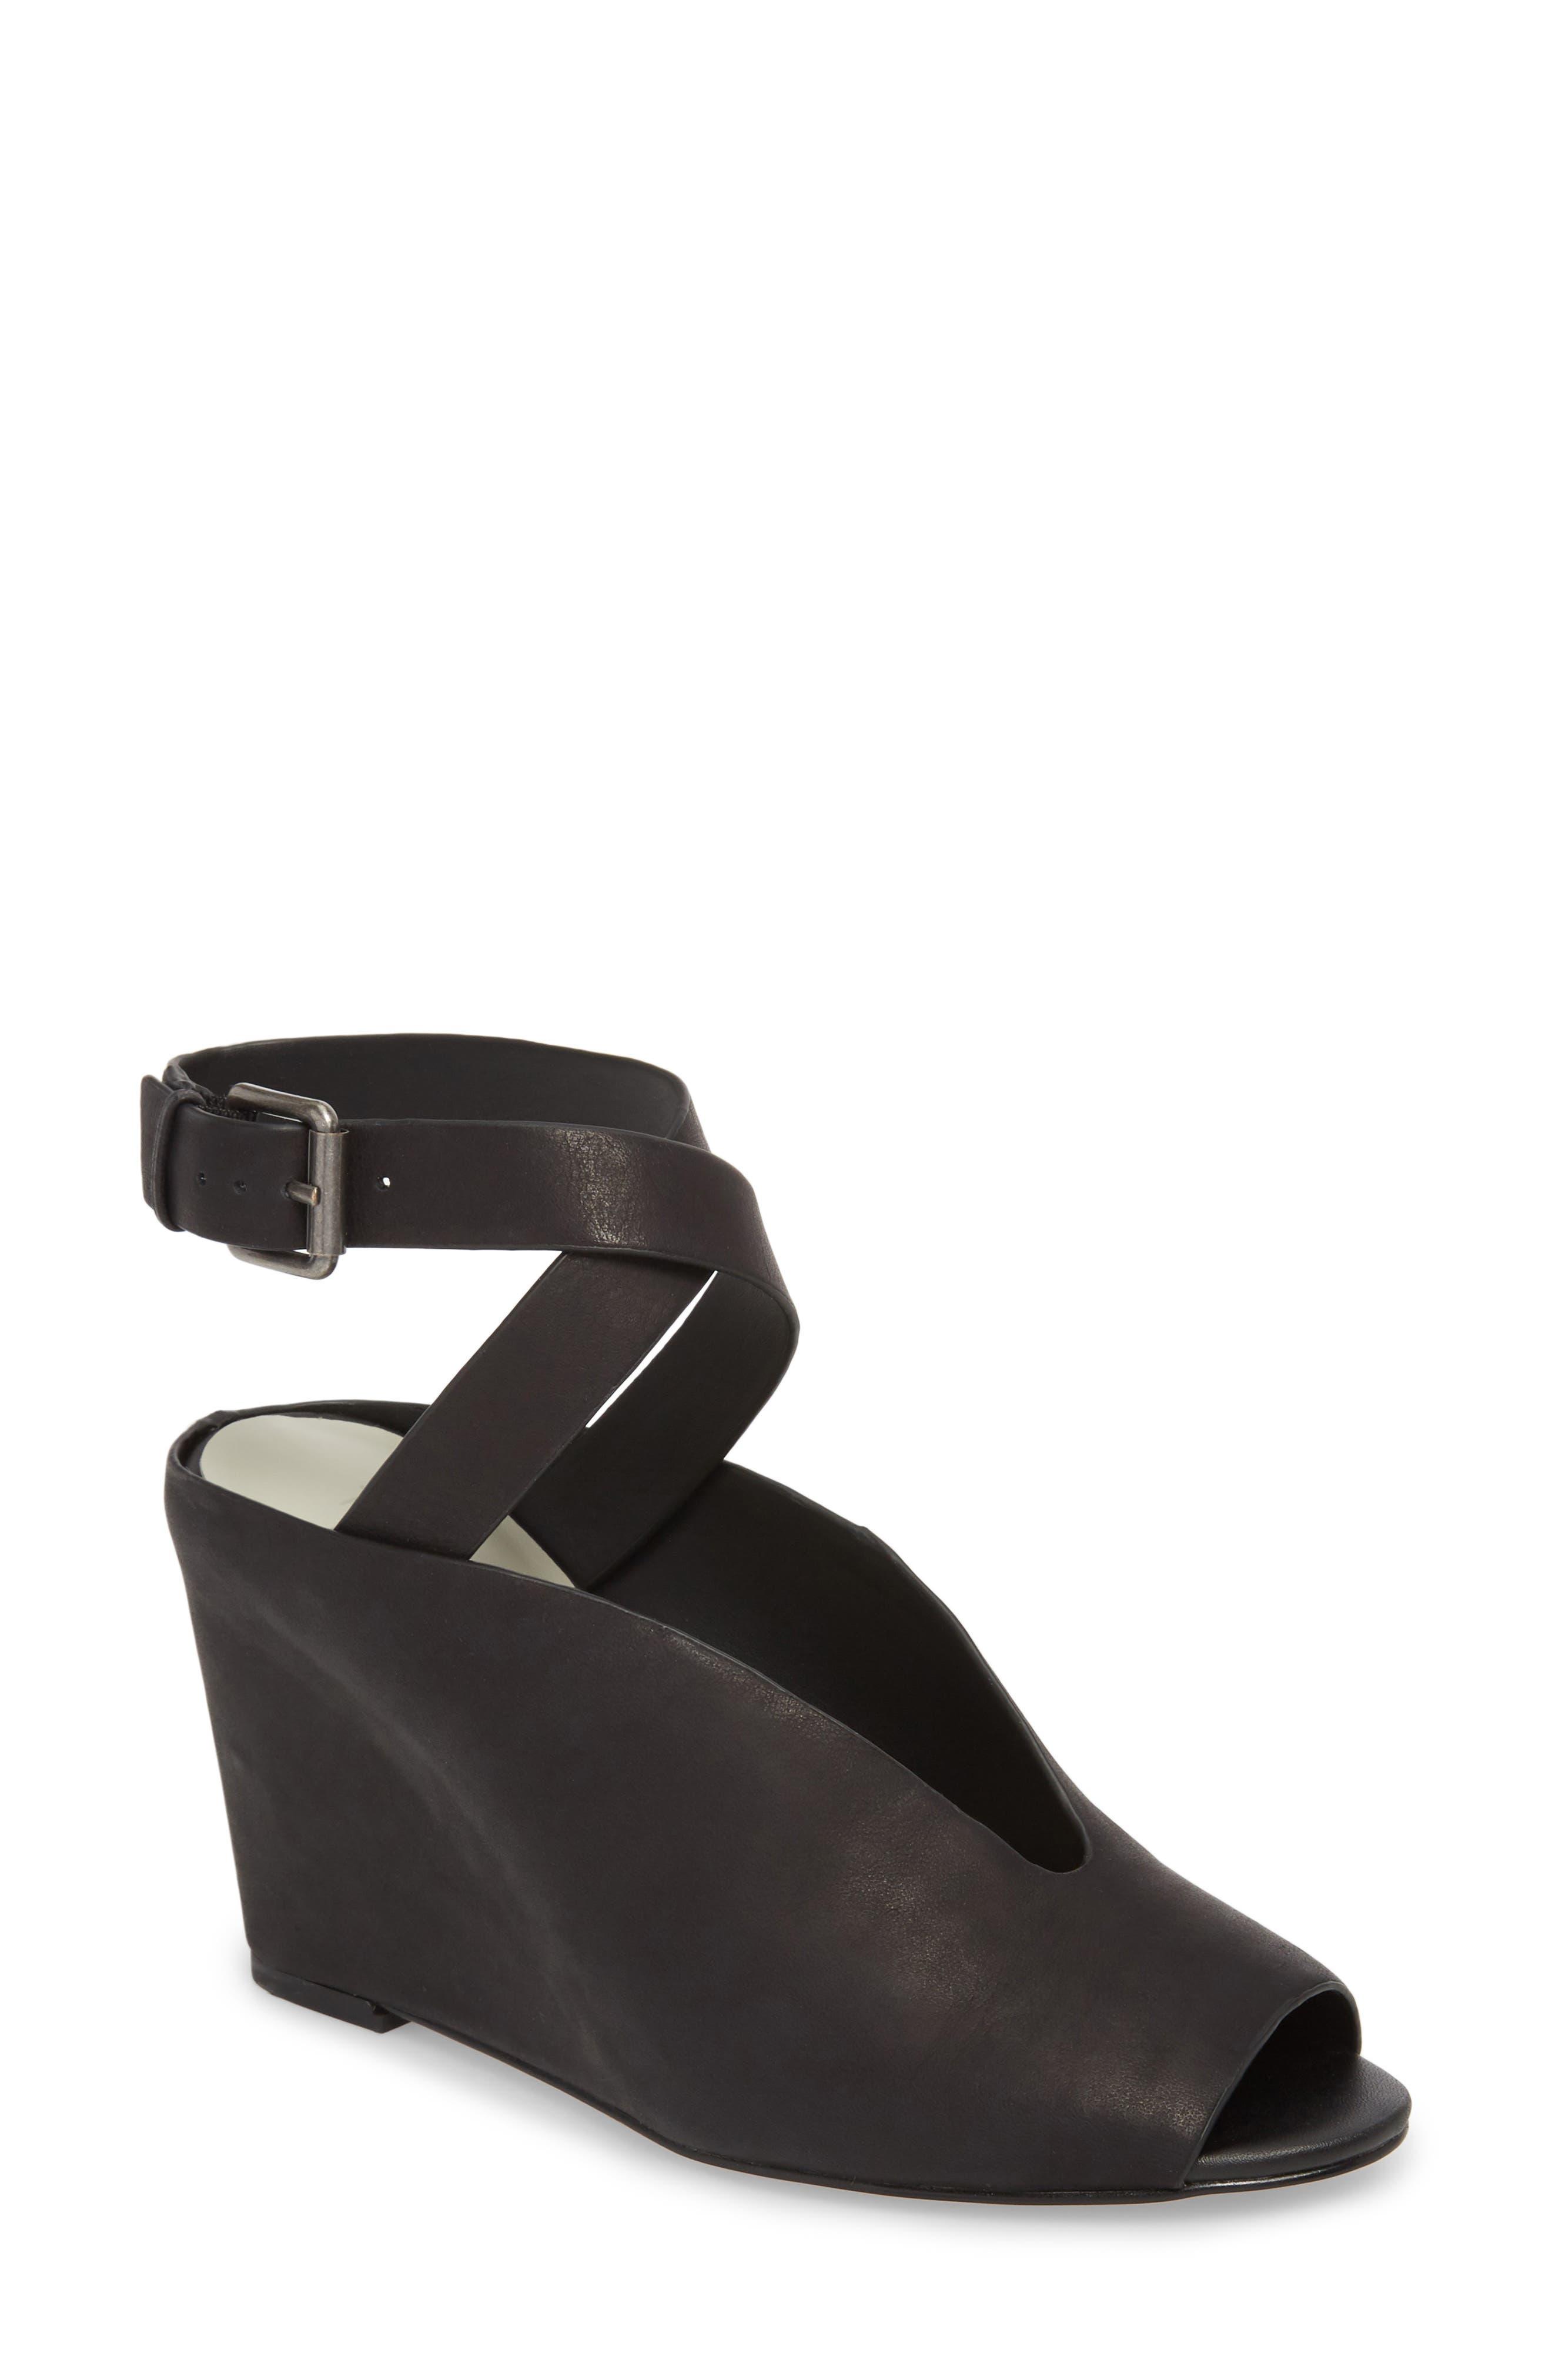 Felidia Wedge Sandal,                         Main,                         color, Black Leather